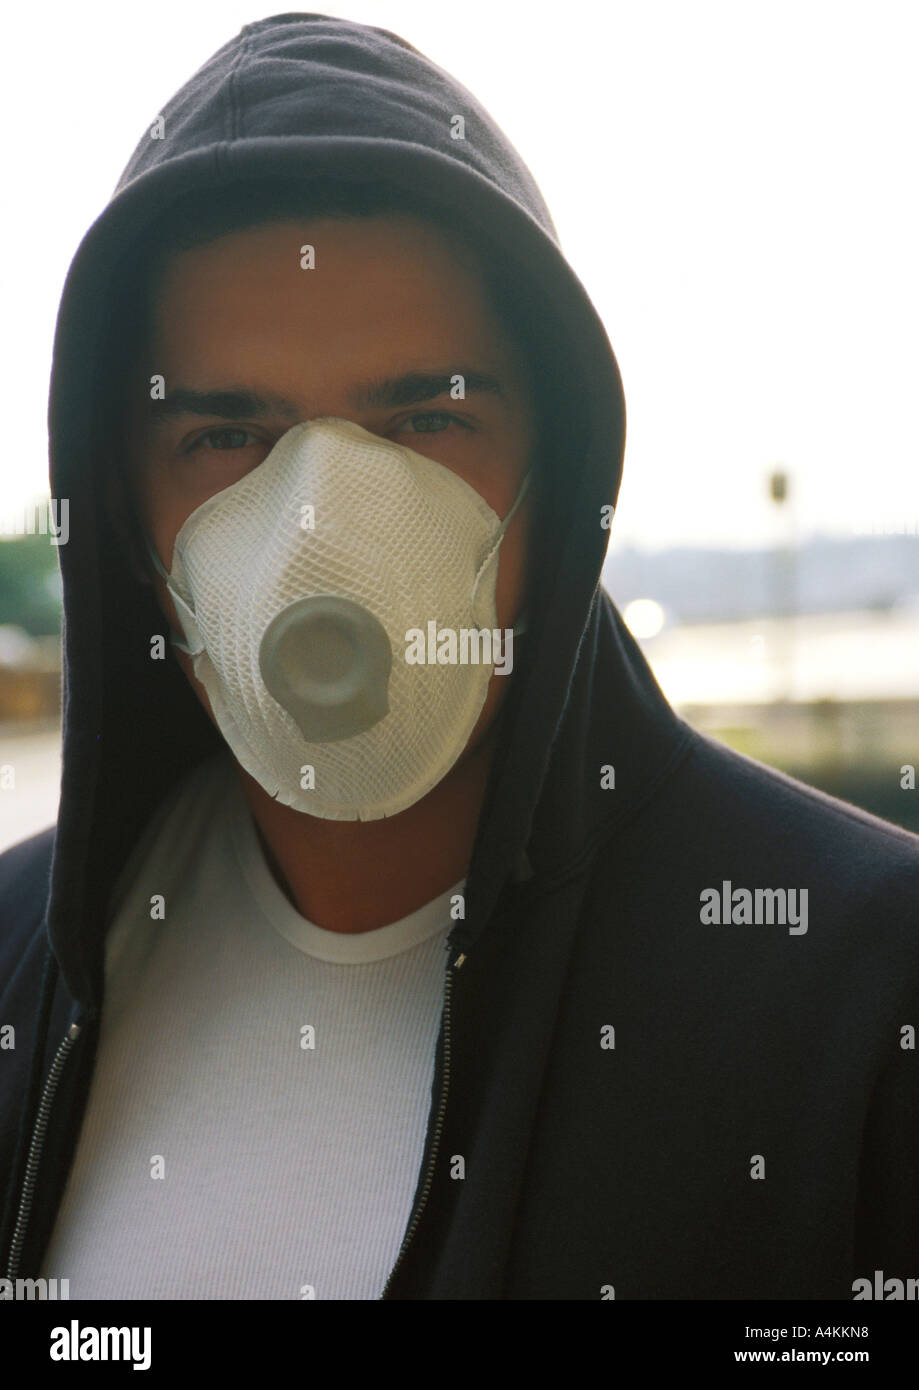 maschera antipolvere naso